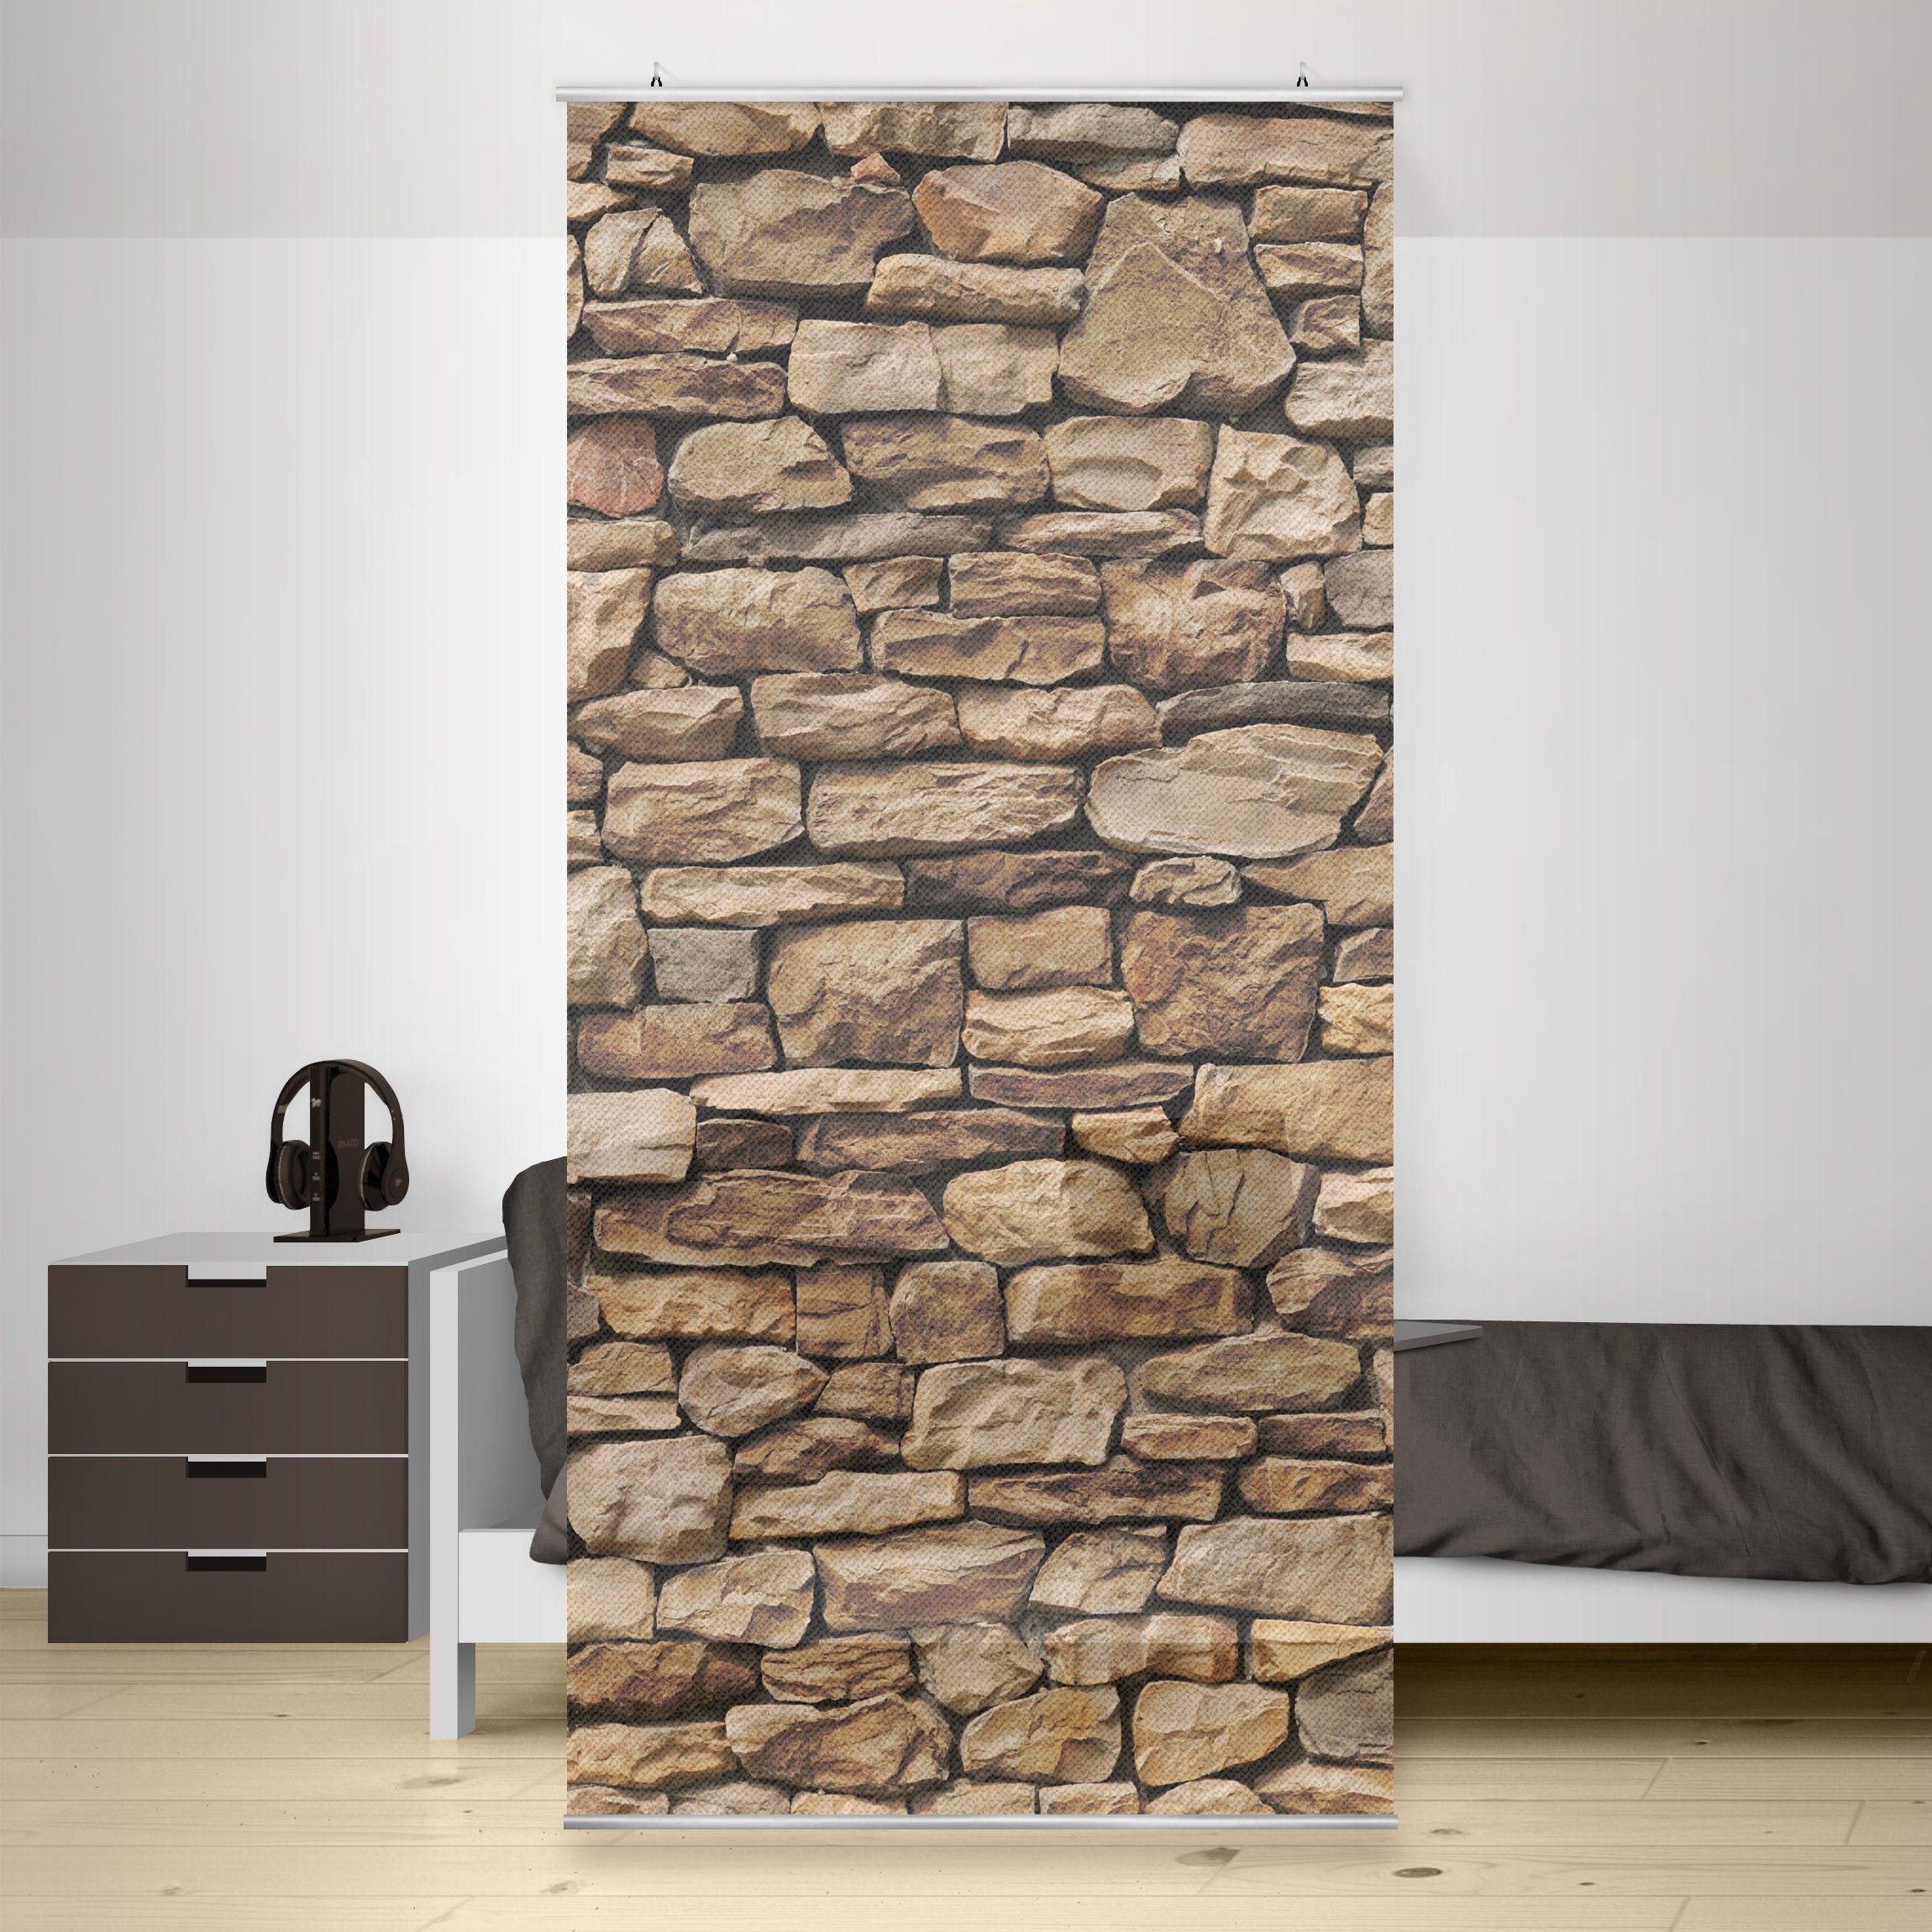 Raumteiler amerikanische steinwand xcm project ideas and house